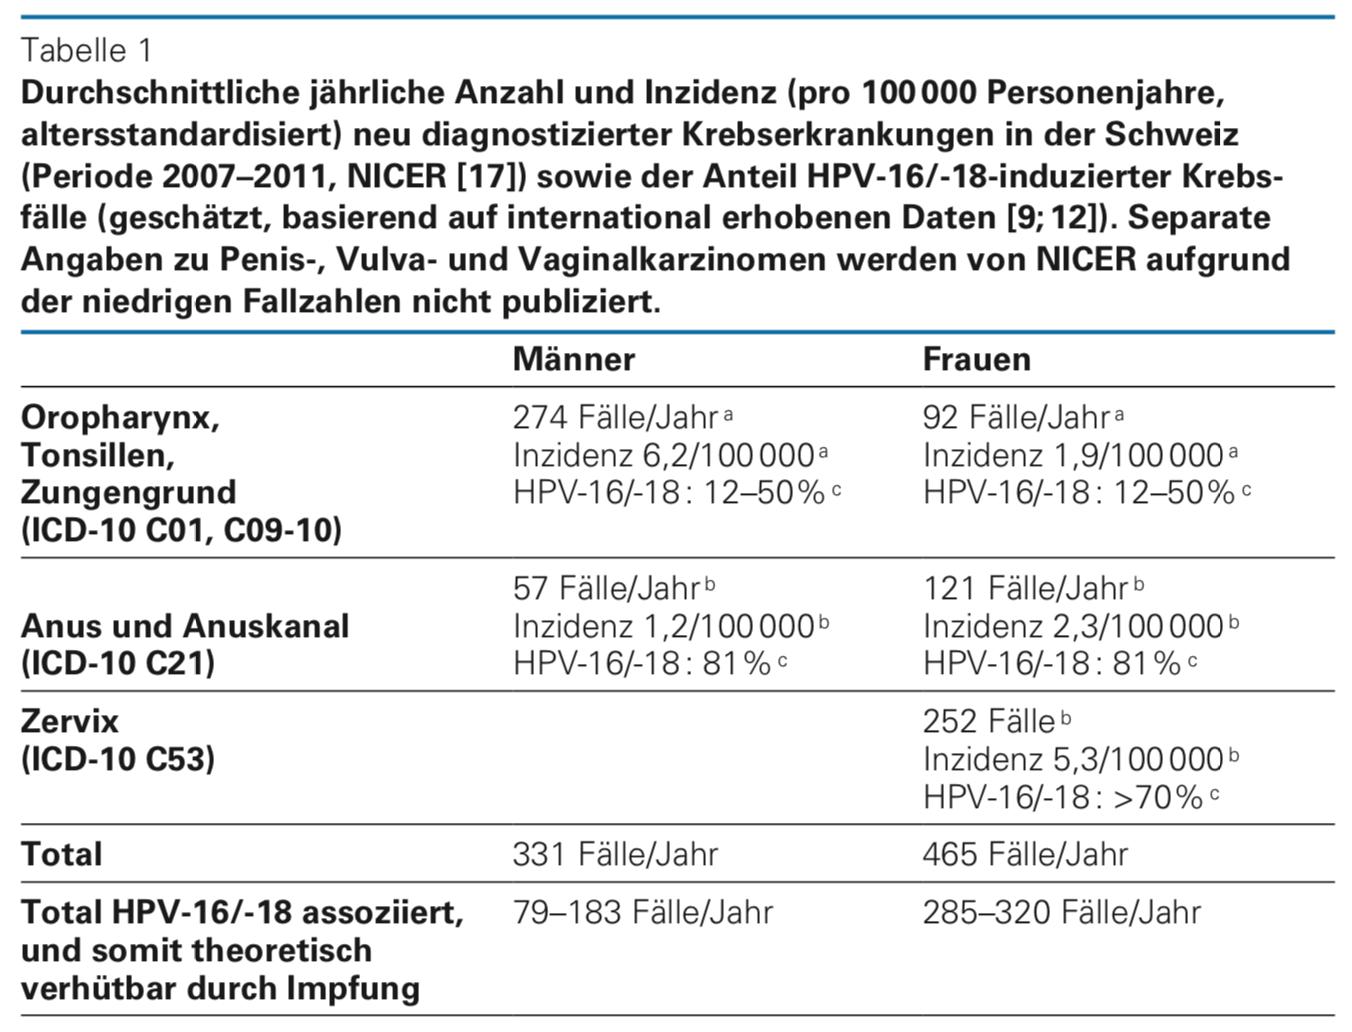 hpv impfung todesfalle 2020